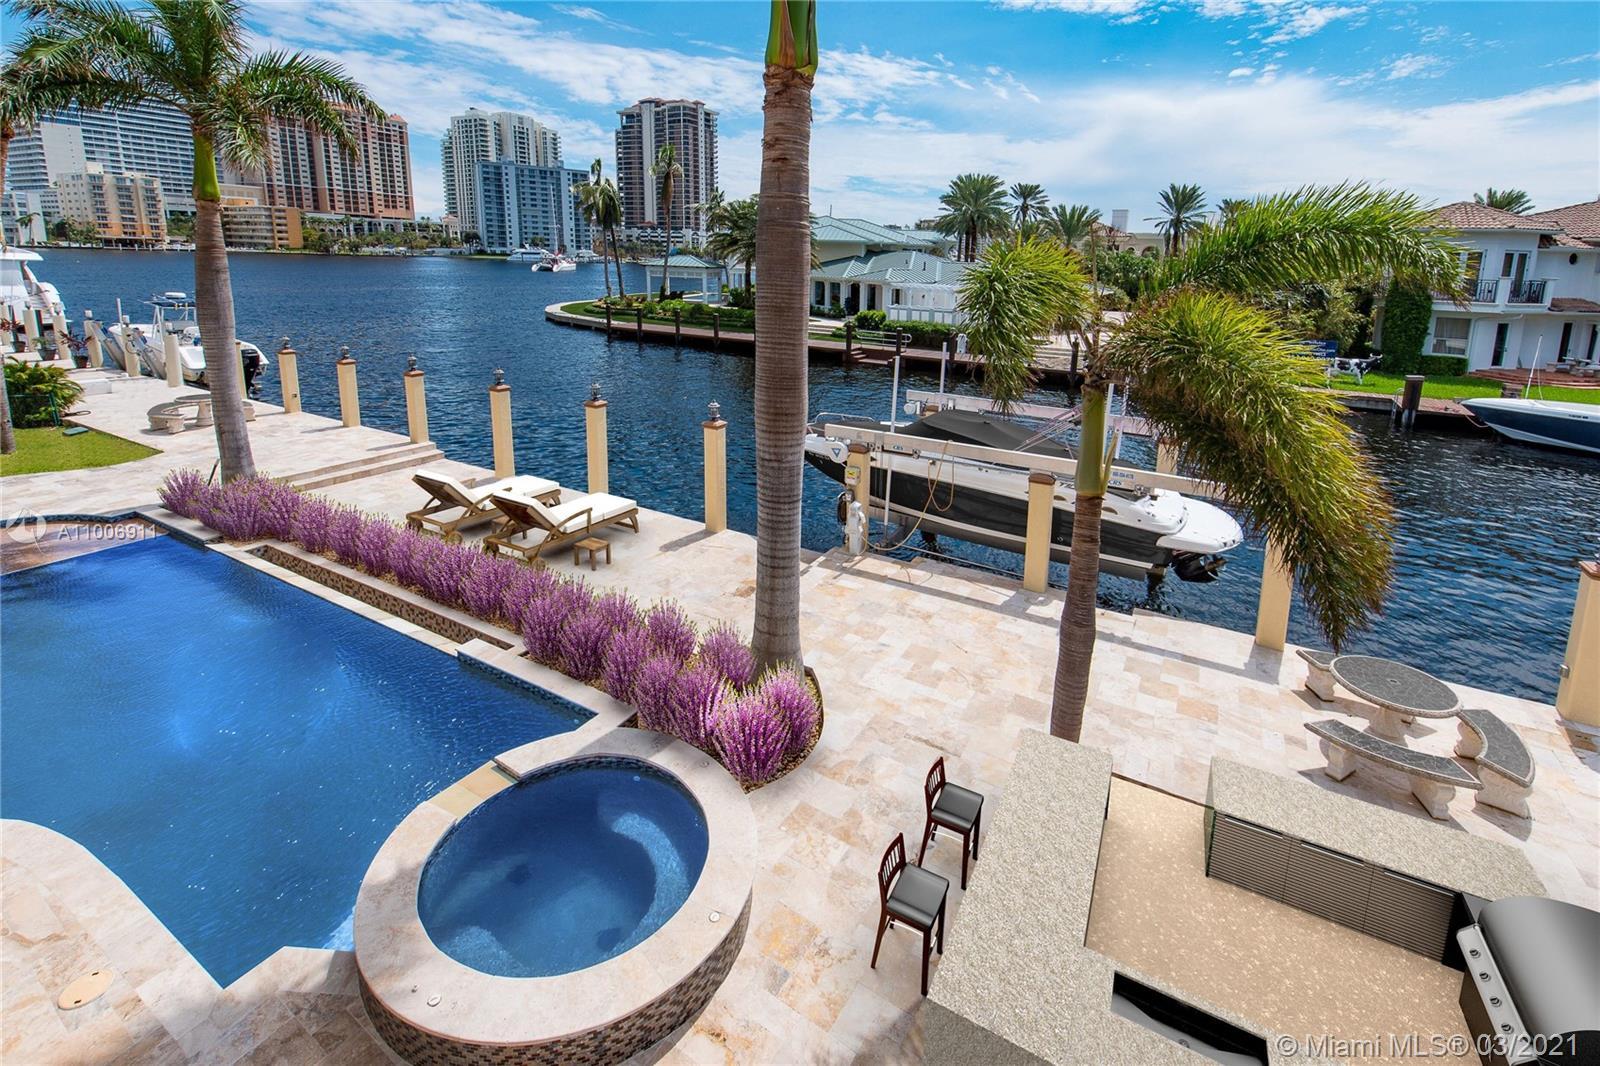 2708 Sea Island Dr Luxury Real Estate